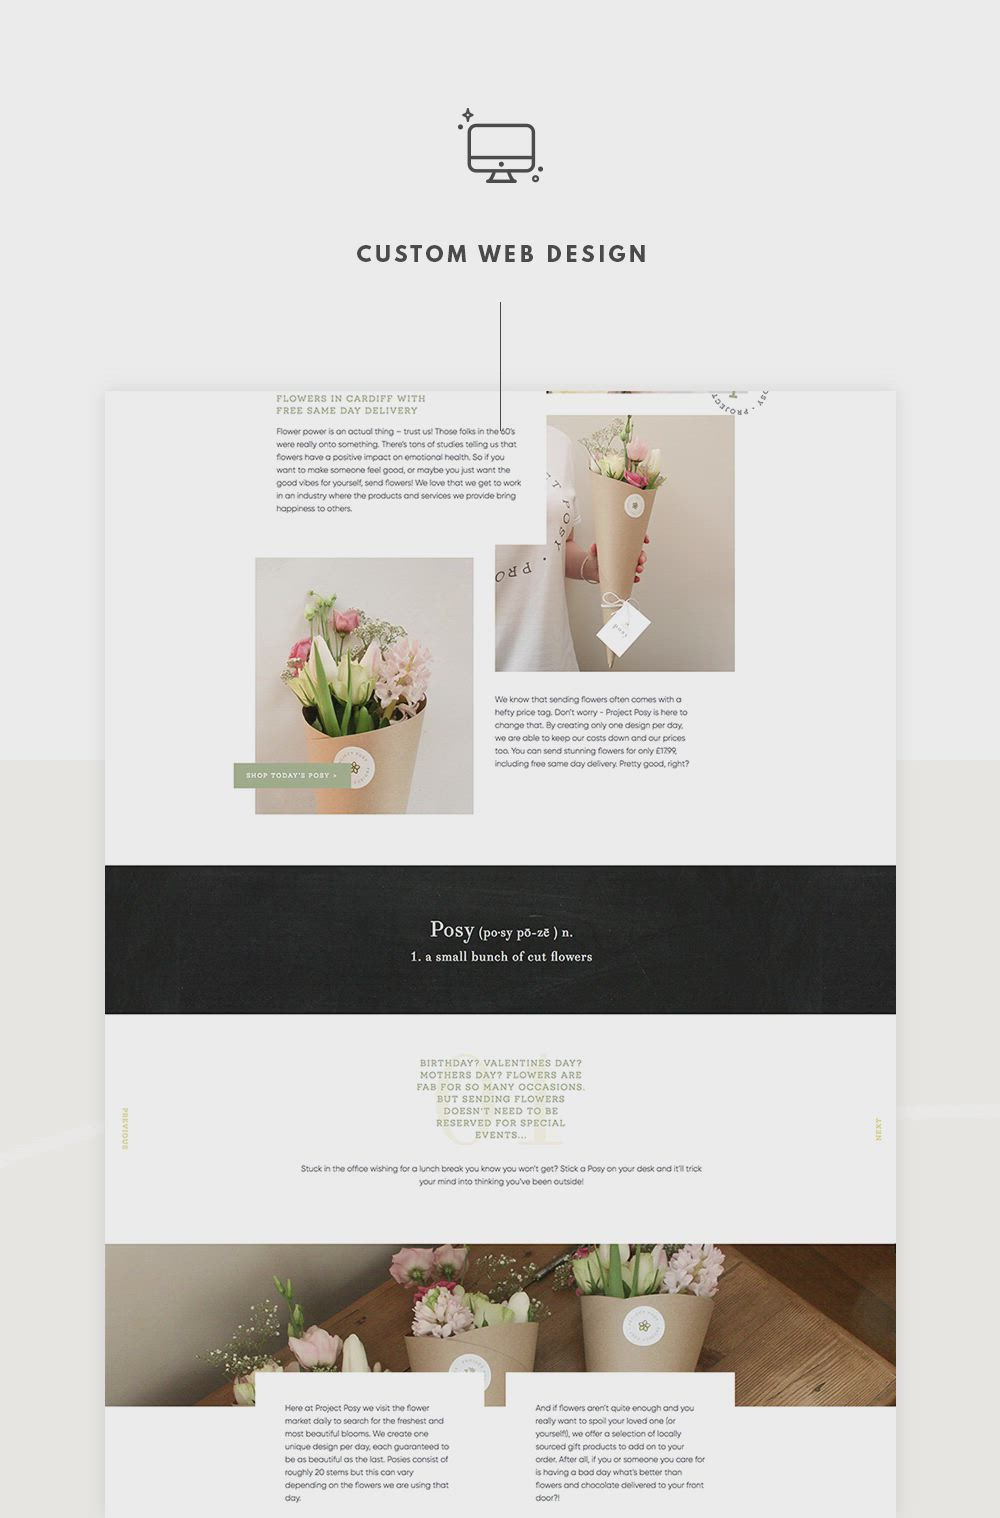 Project Posy Miel Cafe Design Video Video In 2020 Logo Design Inspiration Identity Design Logo Custom Web Design